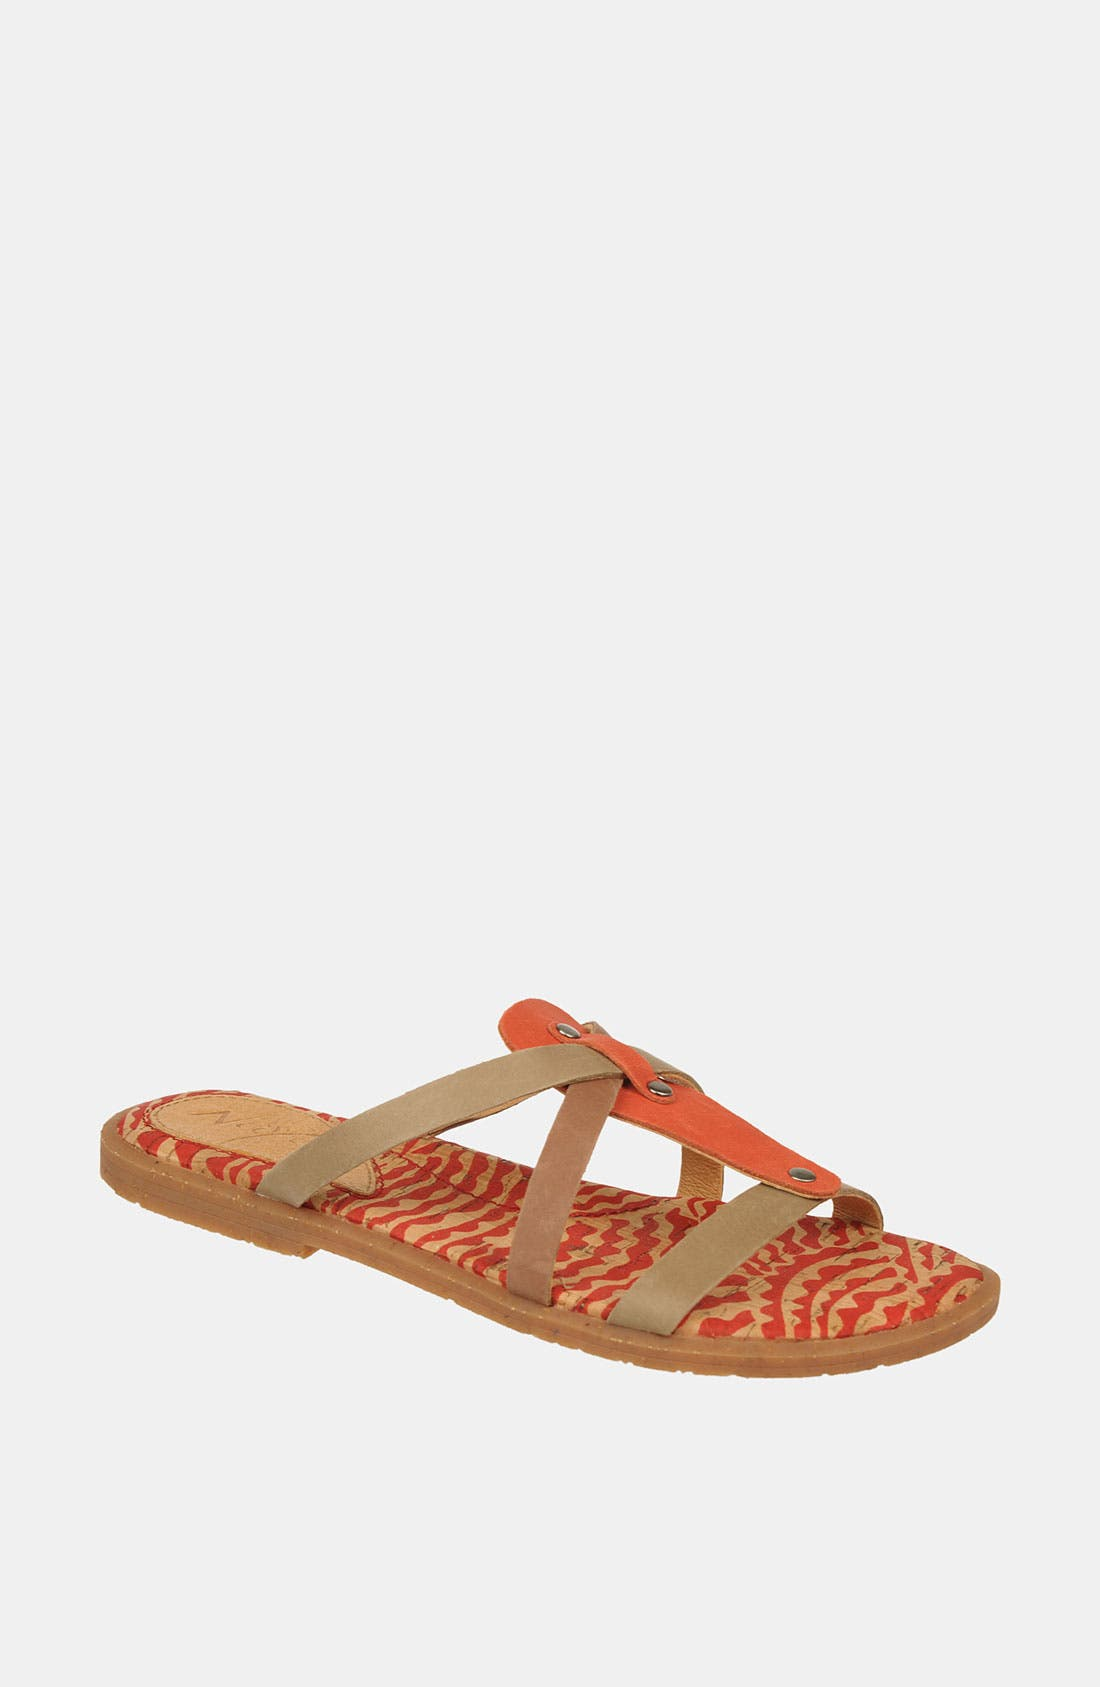 Alternate Image 1 Selected - Naya 'Painted Sock' Sandal